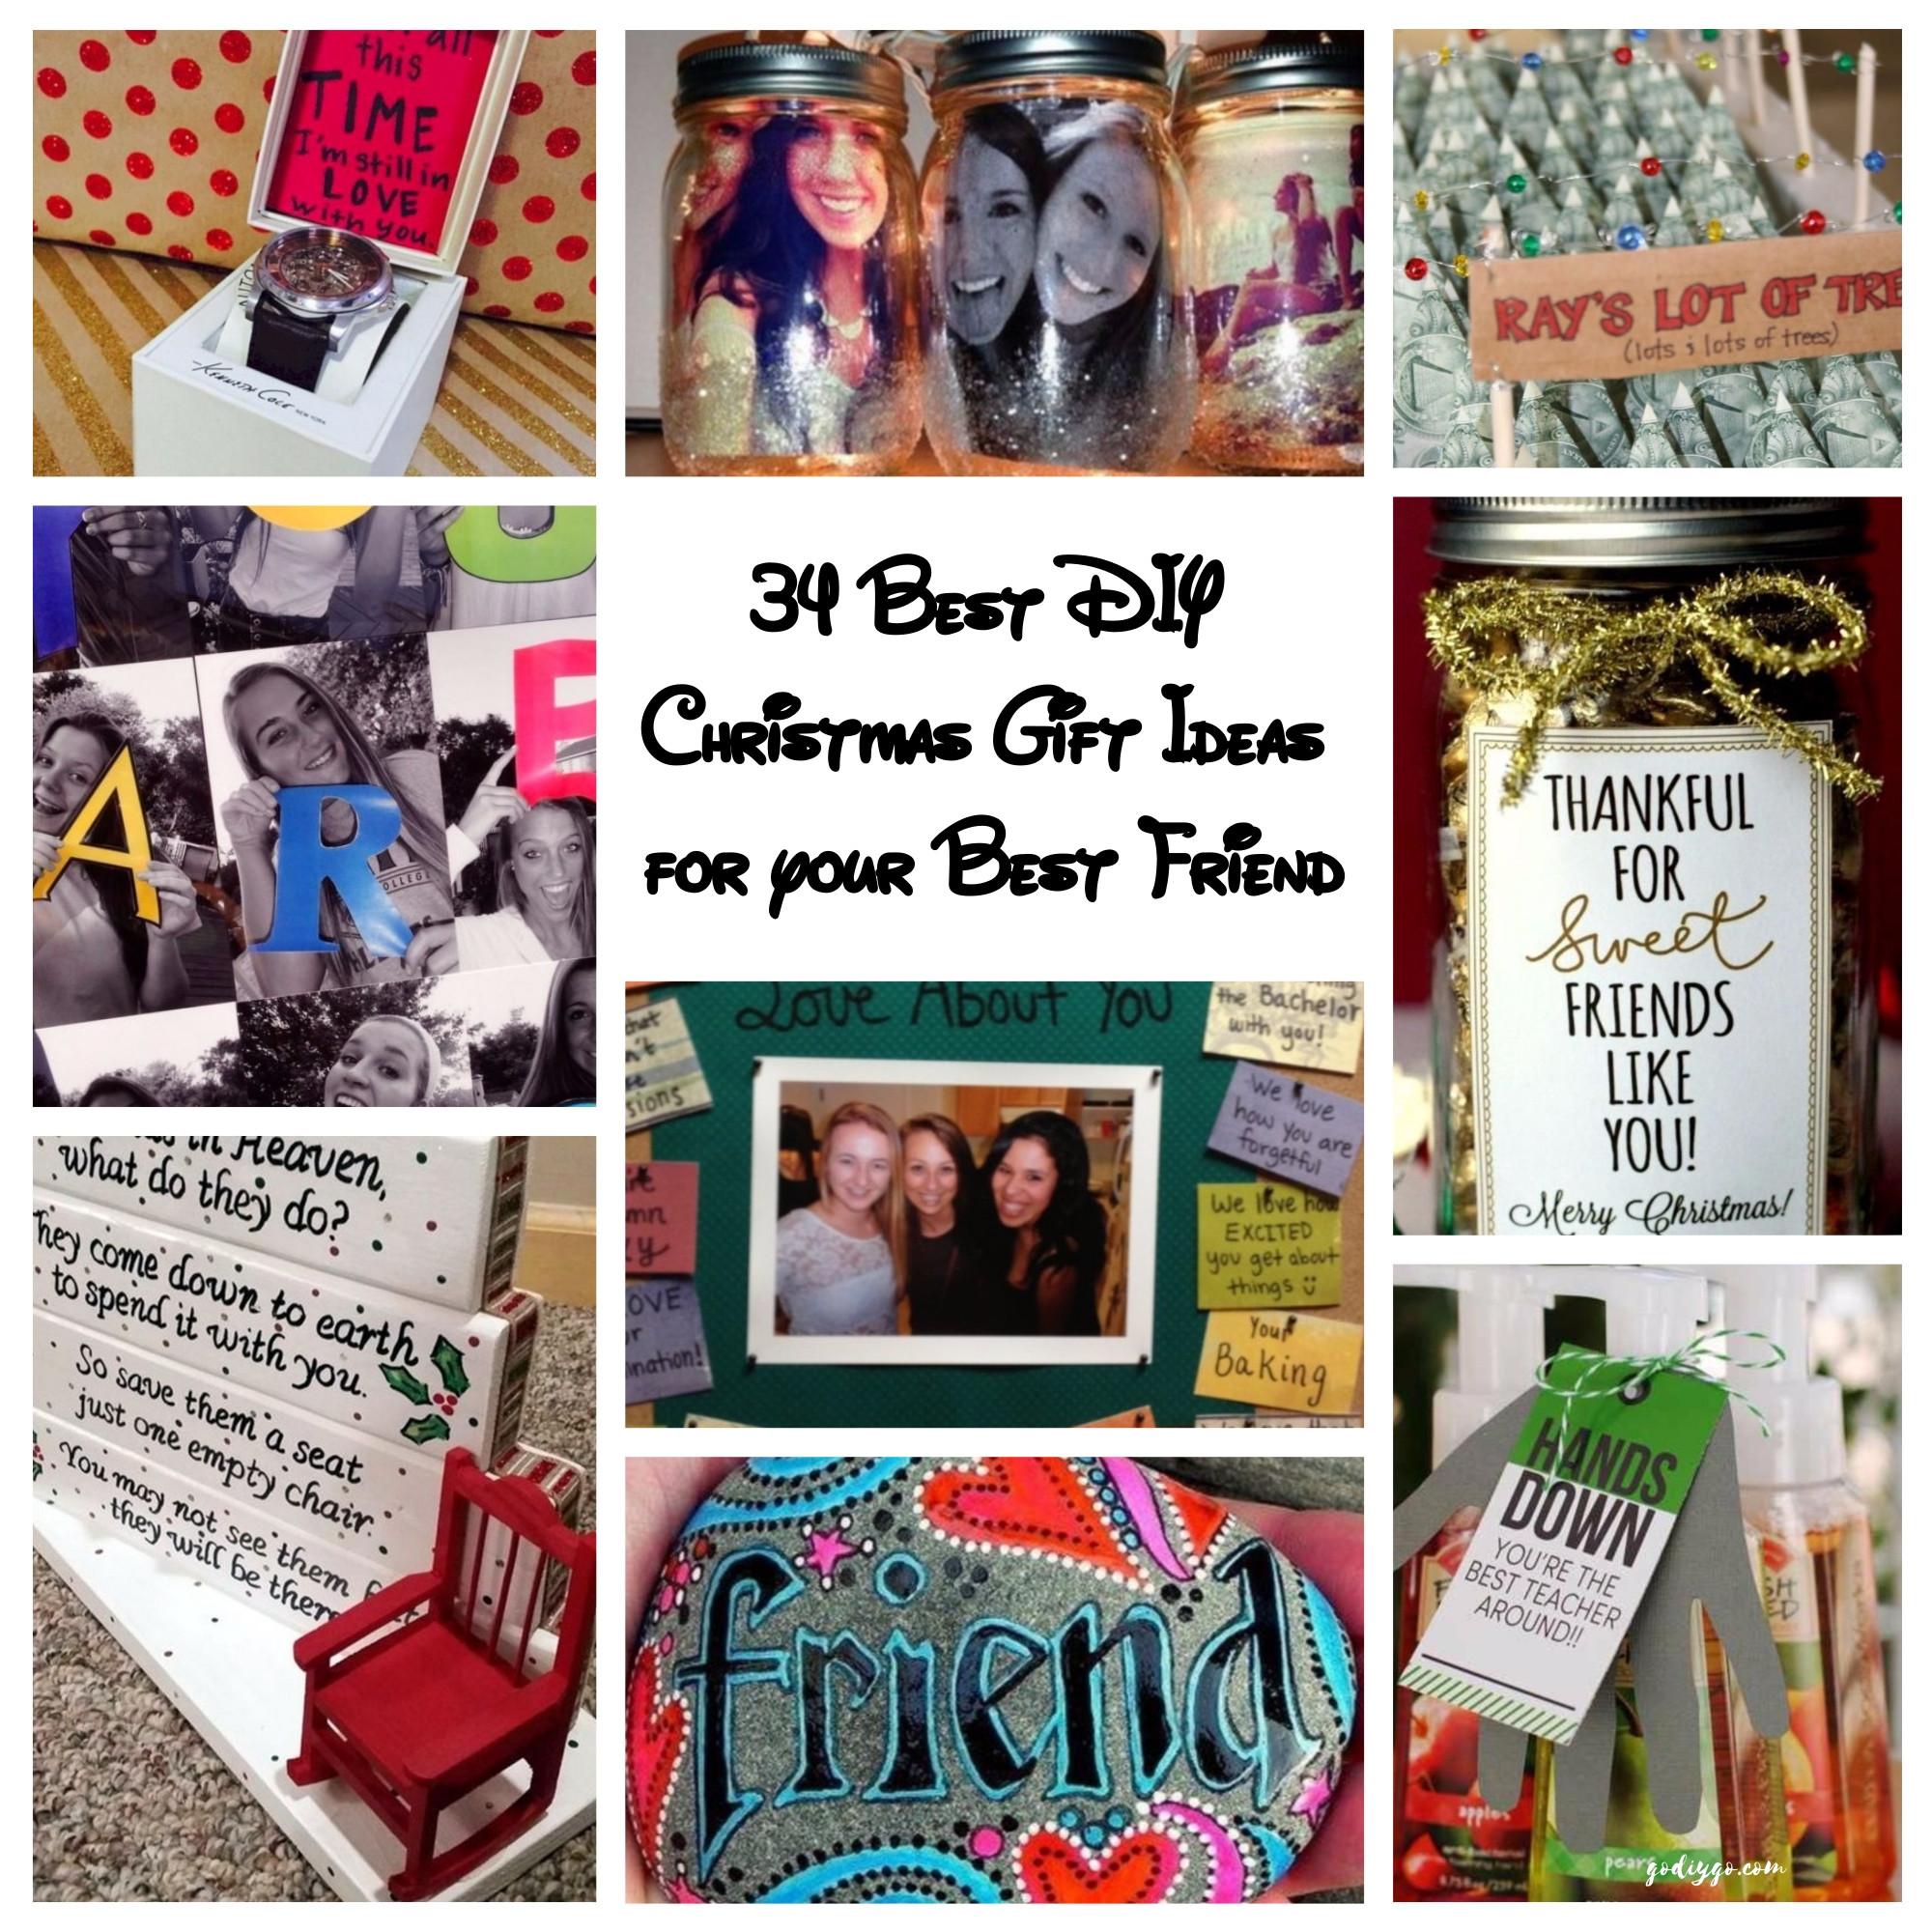 Best Friend Gift Ideas Diy  34 Best DIY Christmas Gift Ideas for your Best Friend